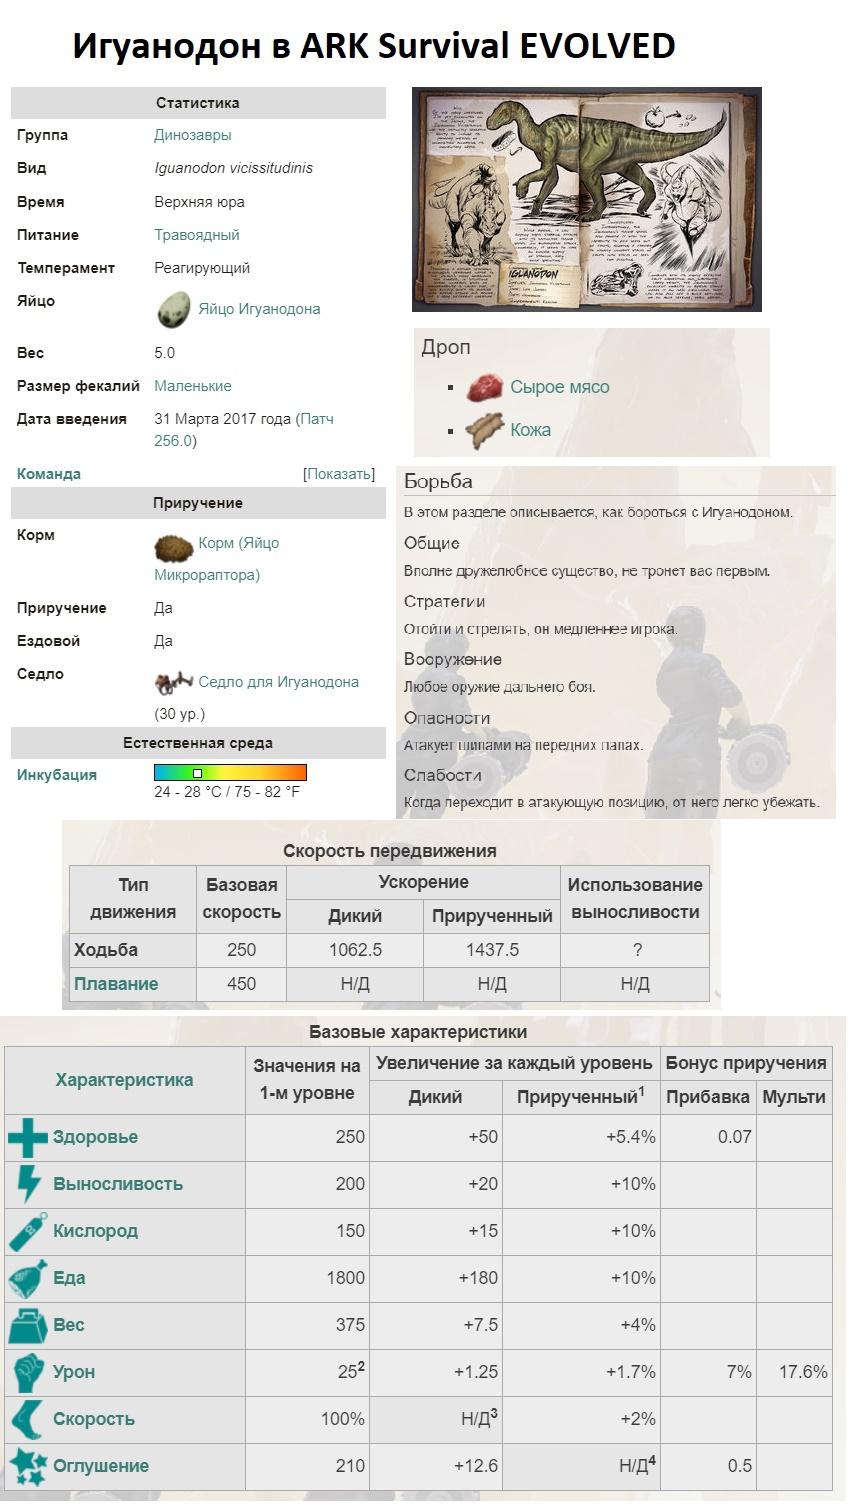 Игуанодон в игре ARK Survival Evolved